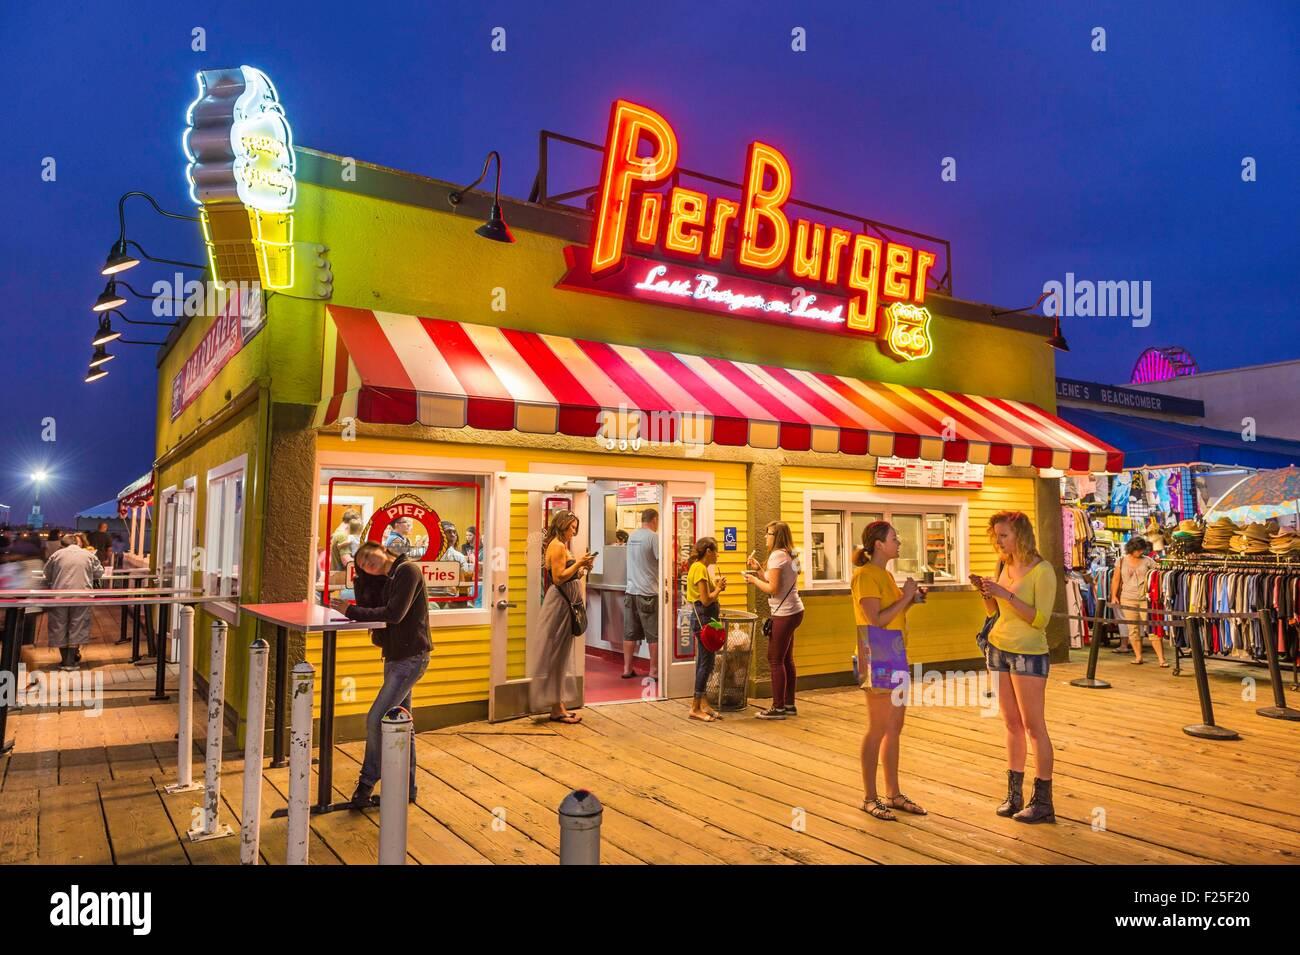 United States, California, Los Angeles, Santa Monica, Santa Monica Pier, Pier Burger restaurant - Stock Image